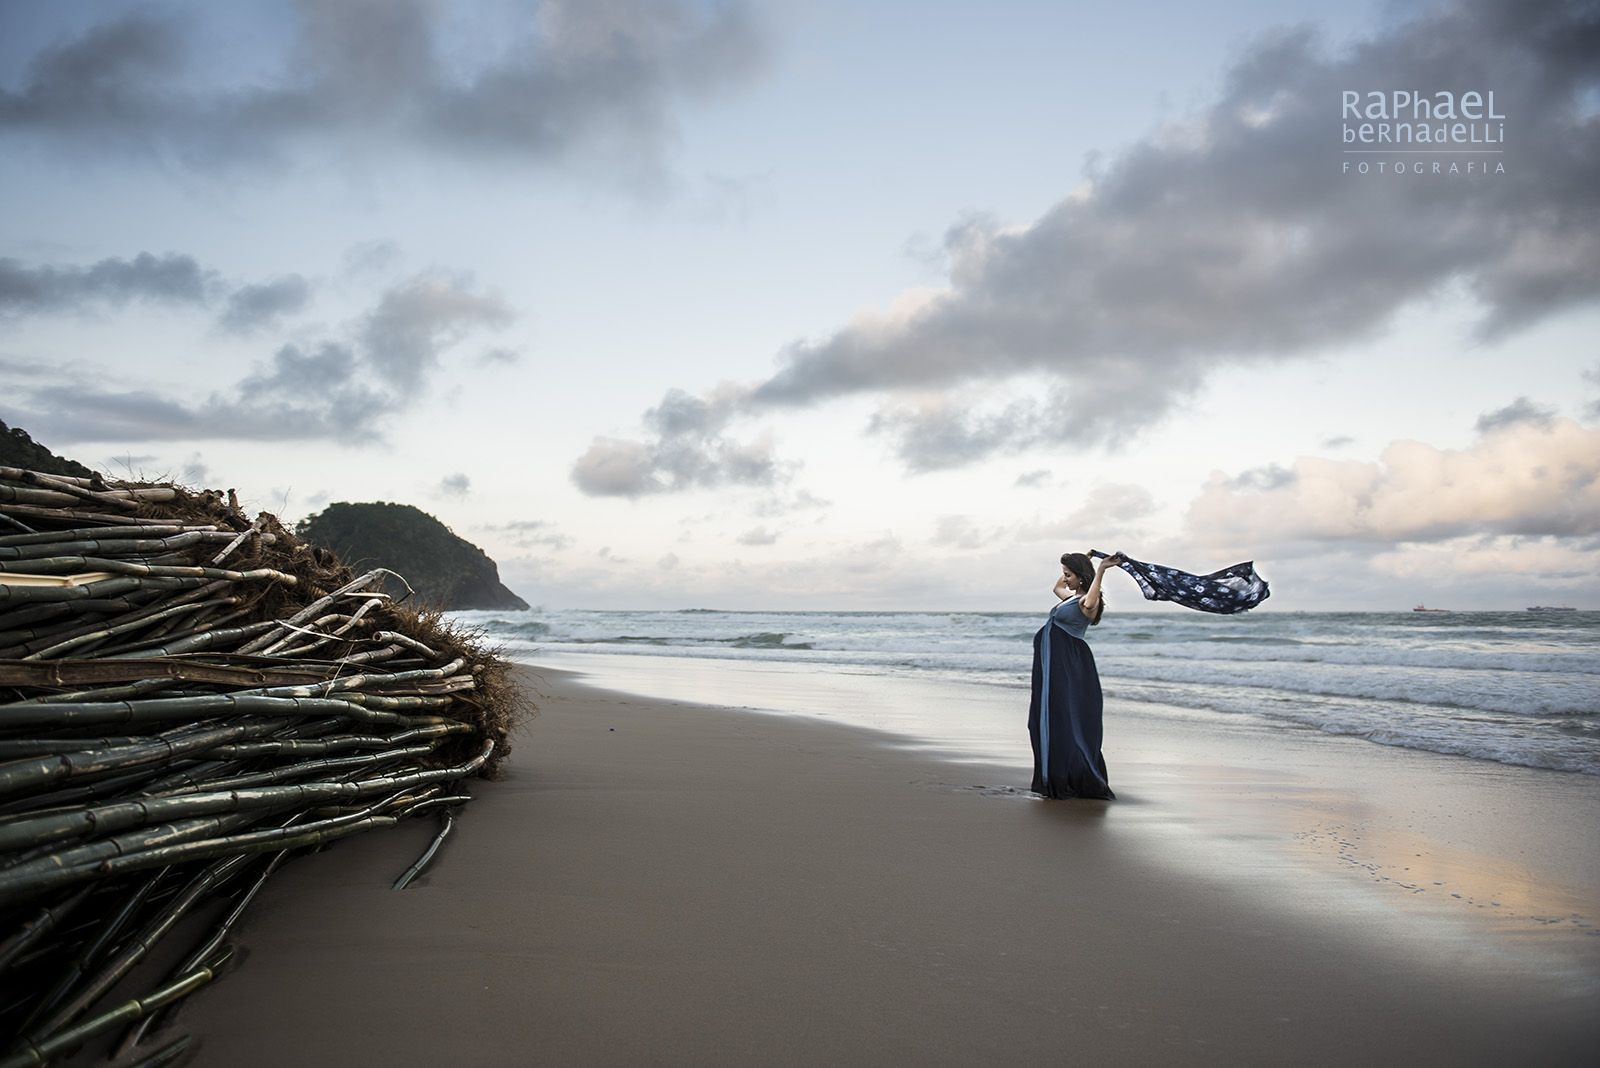 #pregnant #gestante #gravida #bamboo #beach #praiabrava #itajai #santacatarina